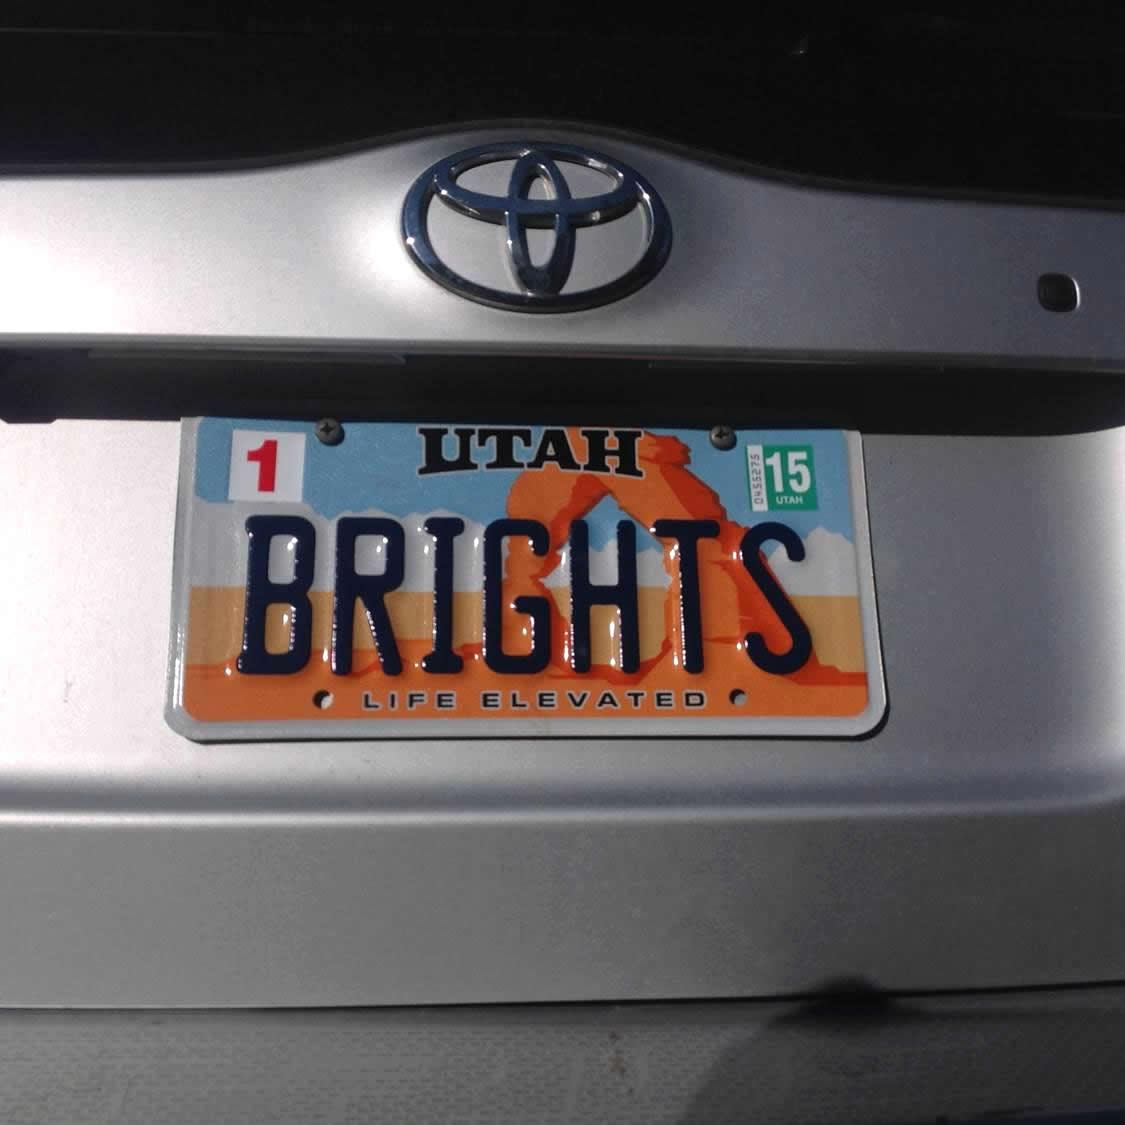 License Plate Utah Brights